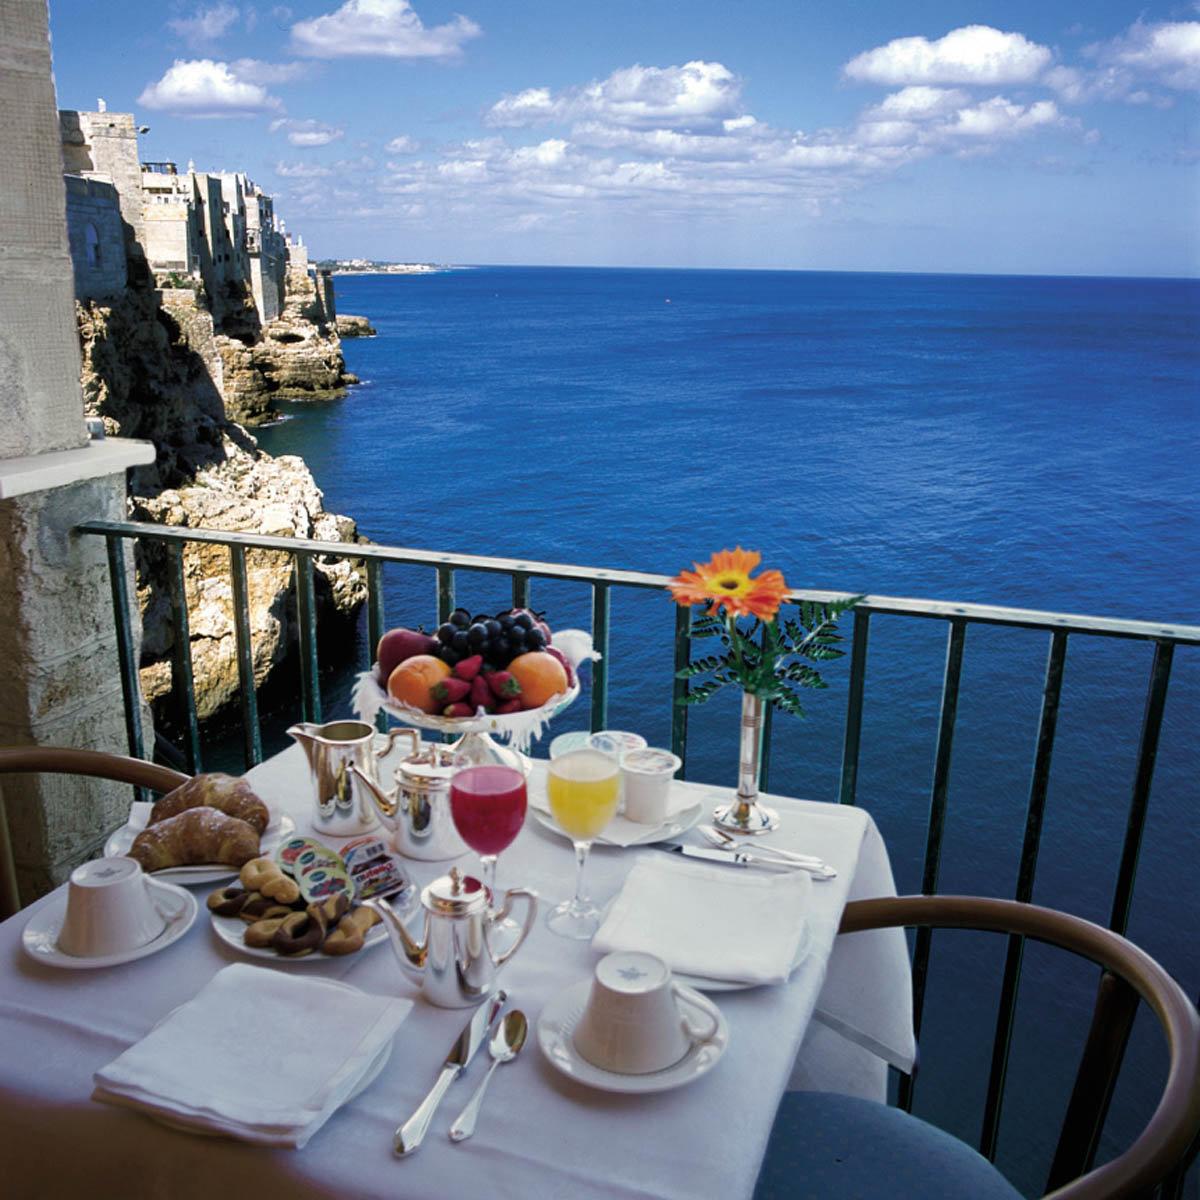 Доброе утро картинки с видом на море